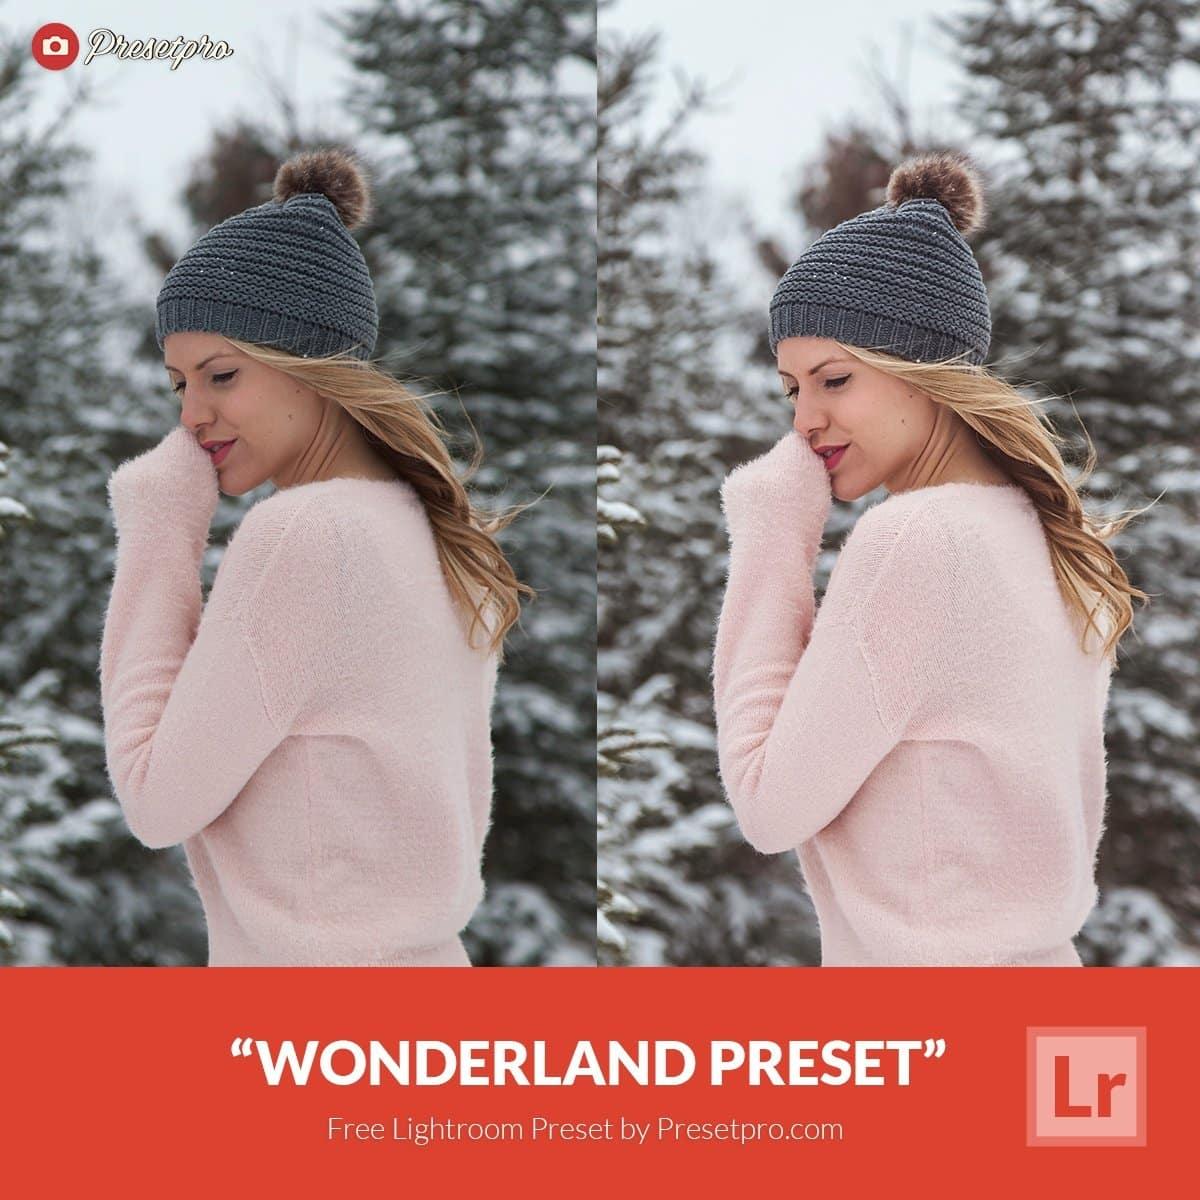 Free-Lightroom-Preset-Wonderland-Presetpro.com